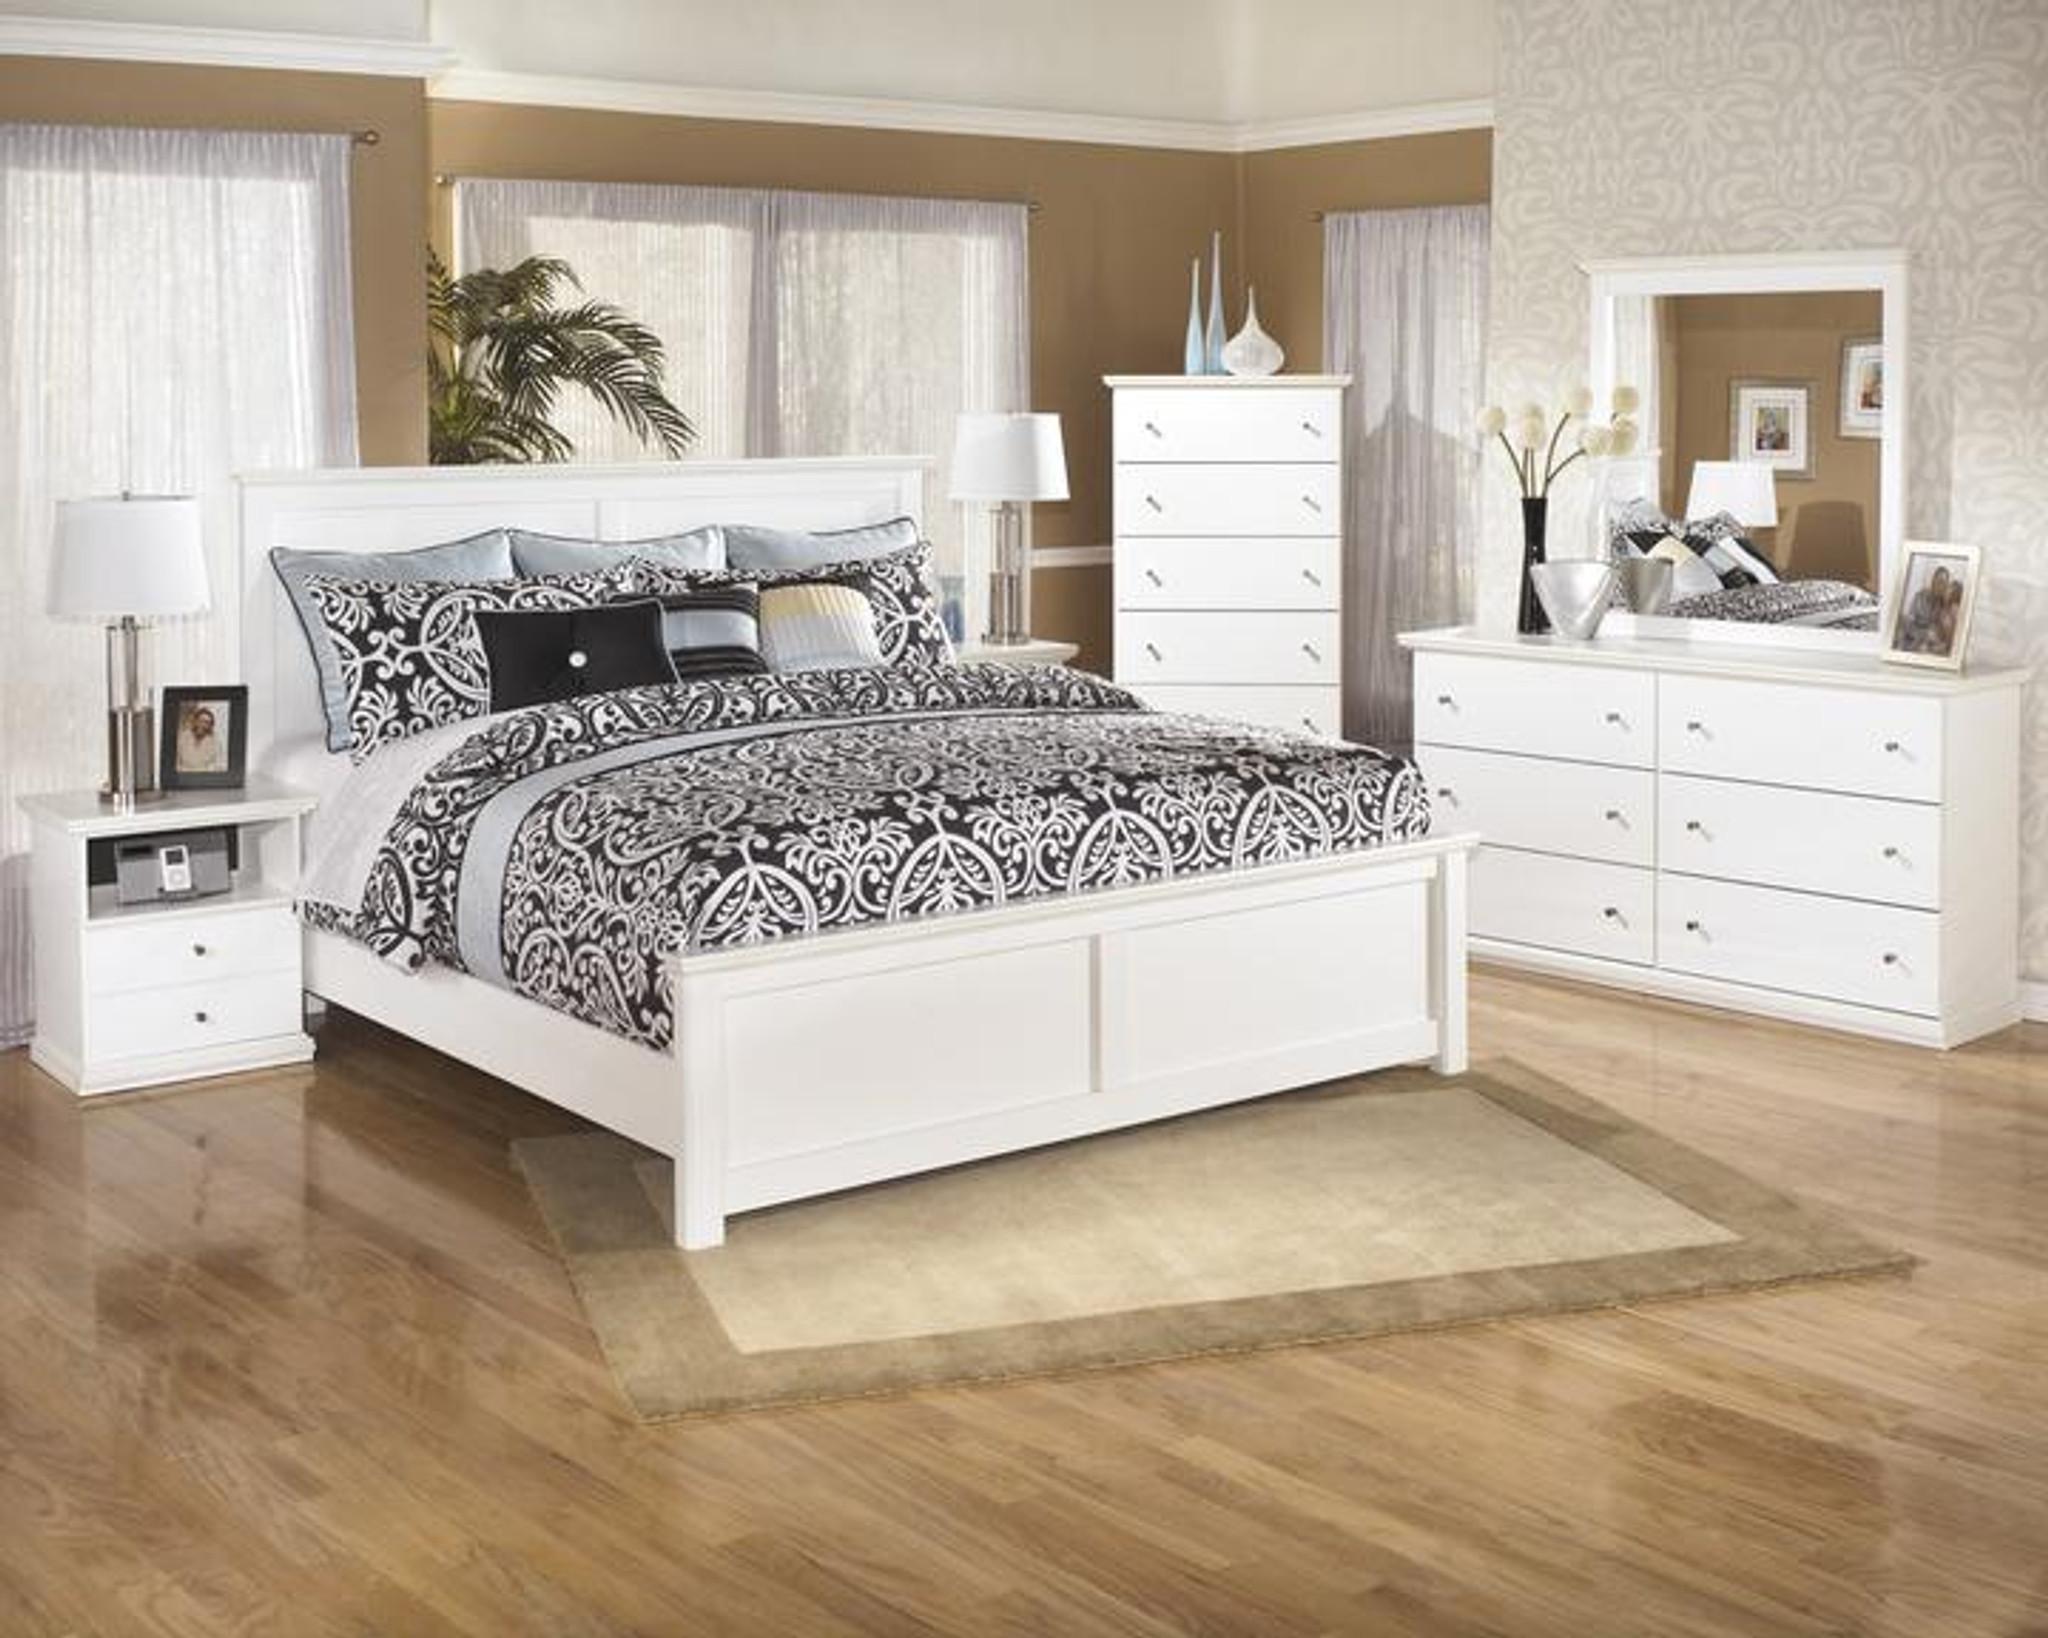 6 Pcs Bostwick Shoals White Panel Bedroom Set By Km Furniture Houston Texas